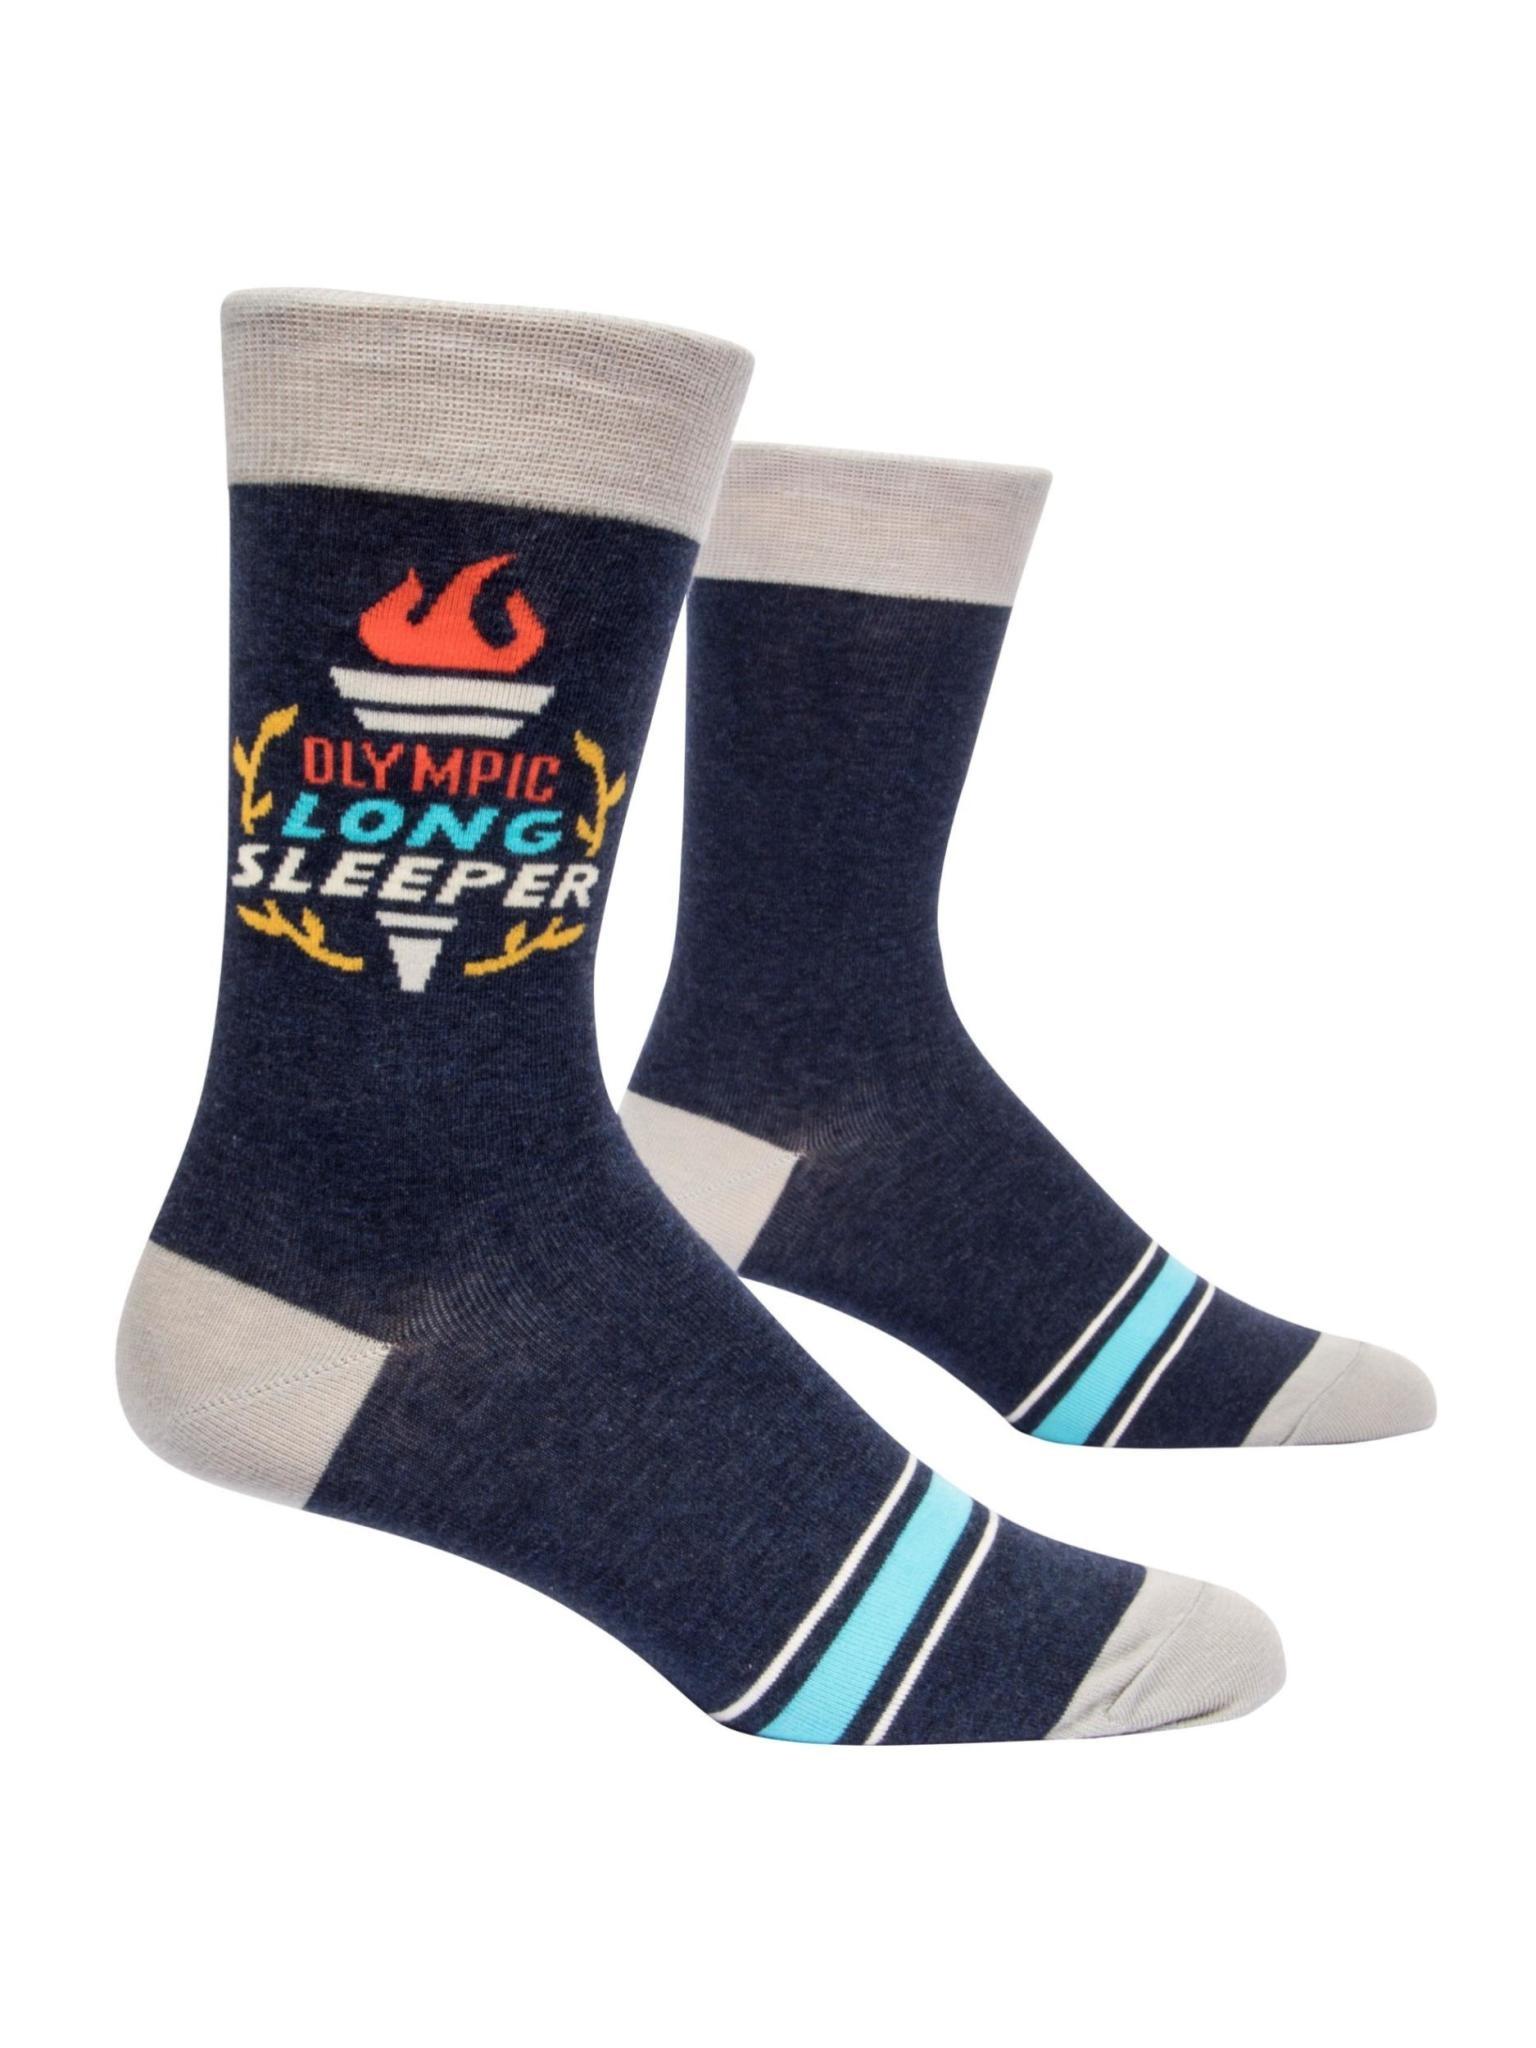 Blue Q Olympic Long Sleeper Men's Crew Socks